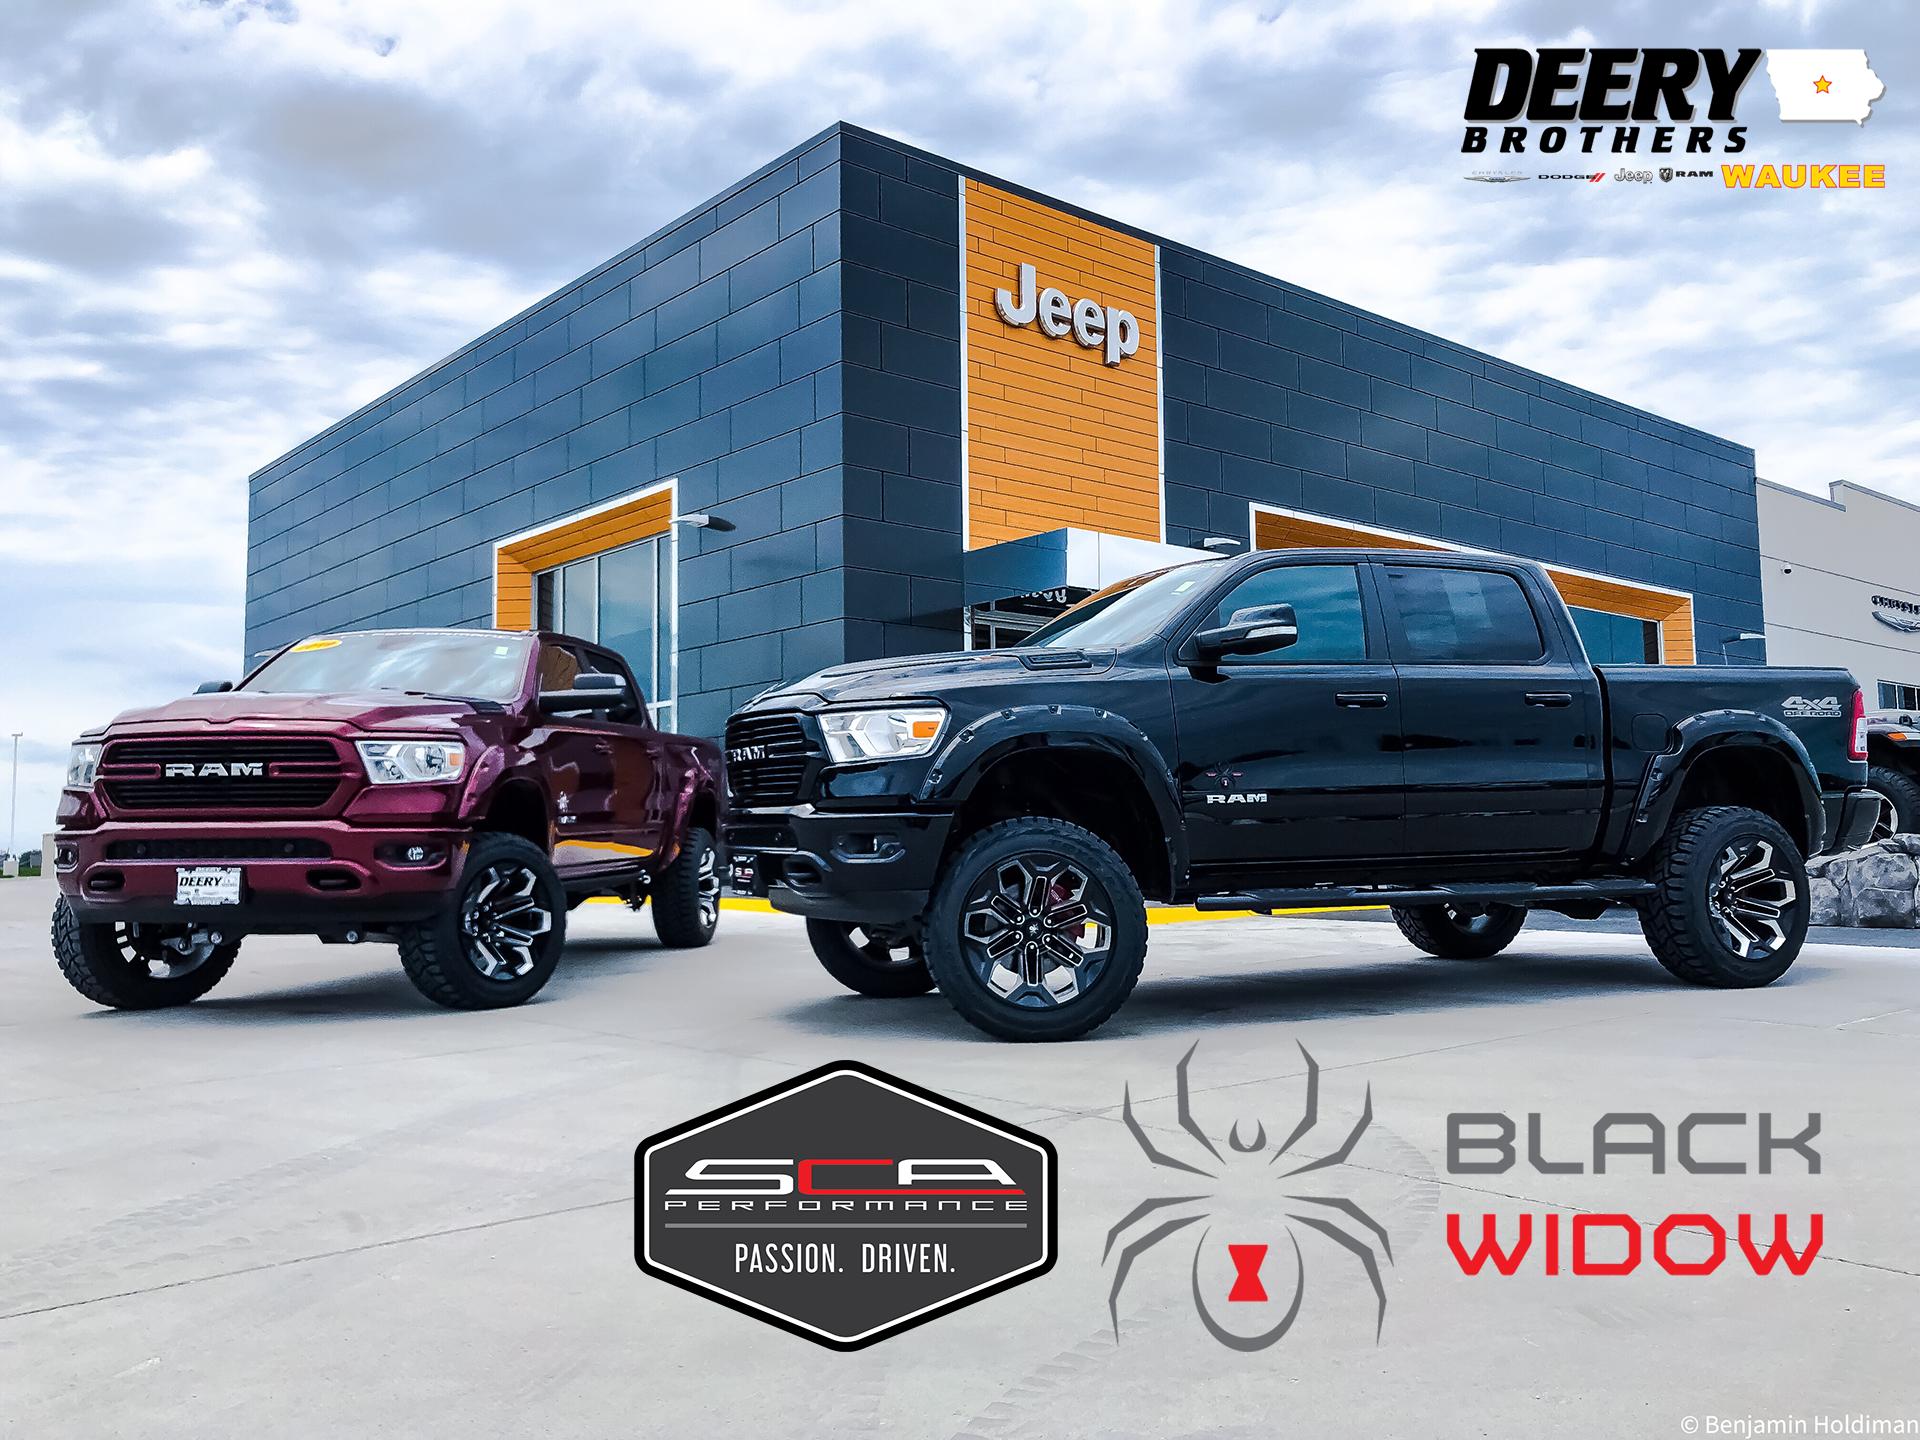 Sca Performance Black Widow Trucks Deery Brothers Chrysler Dodge Jeep Ram